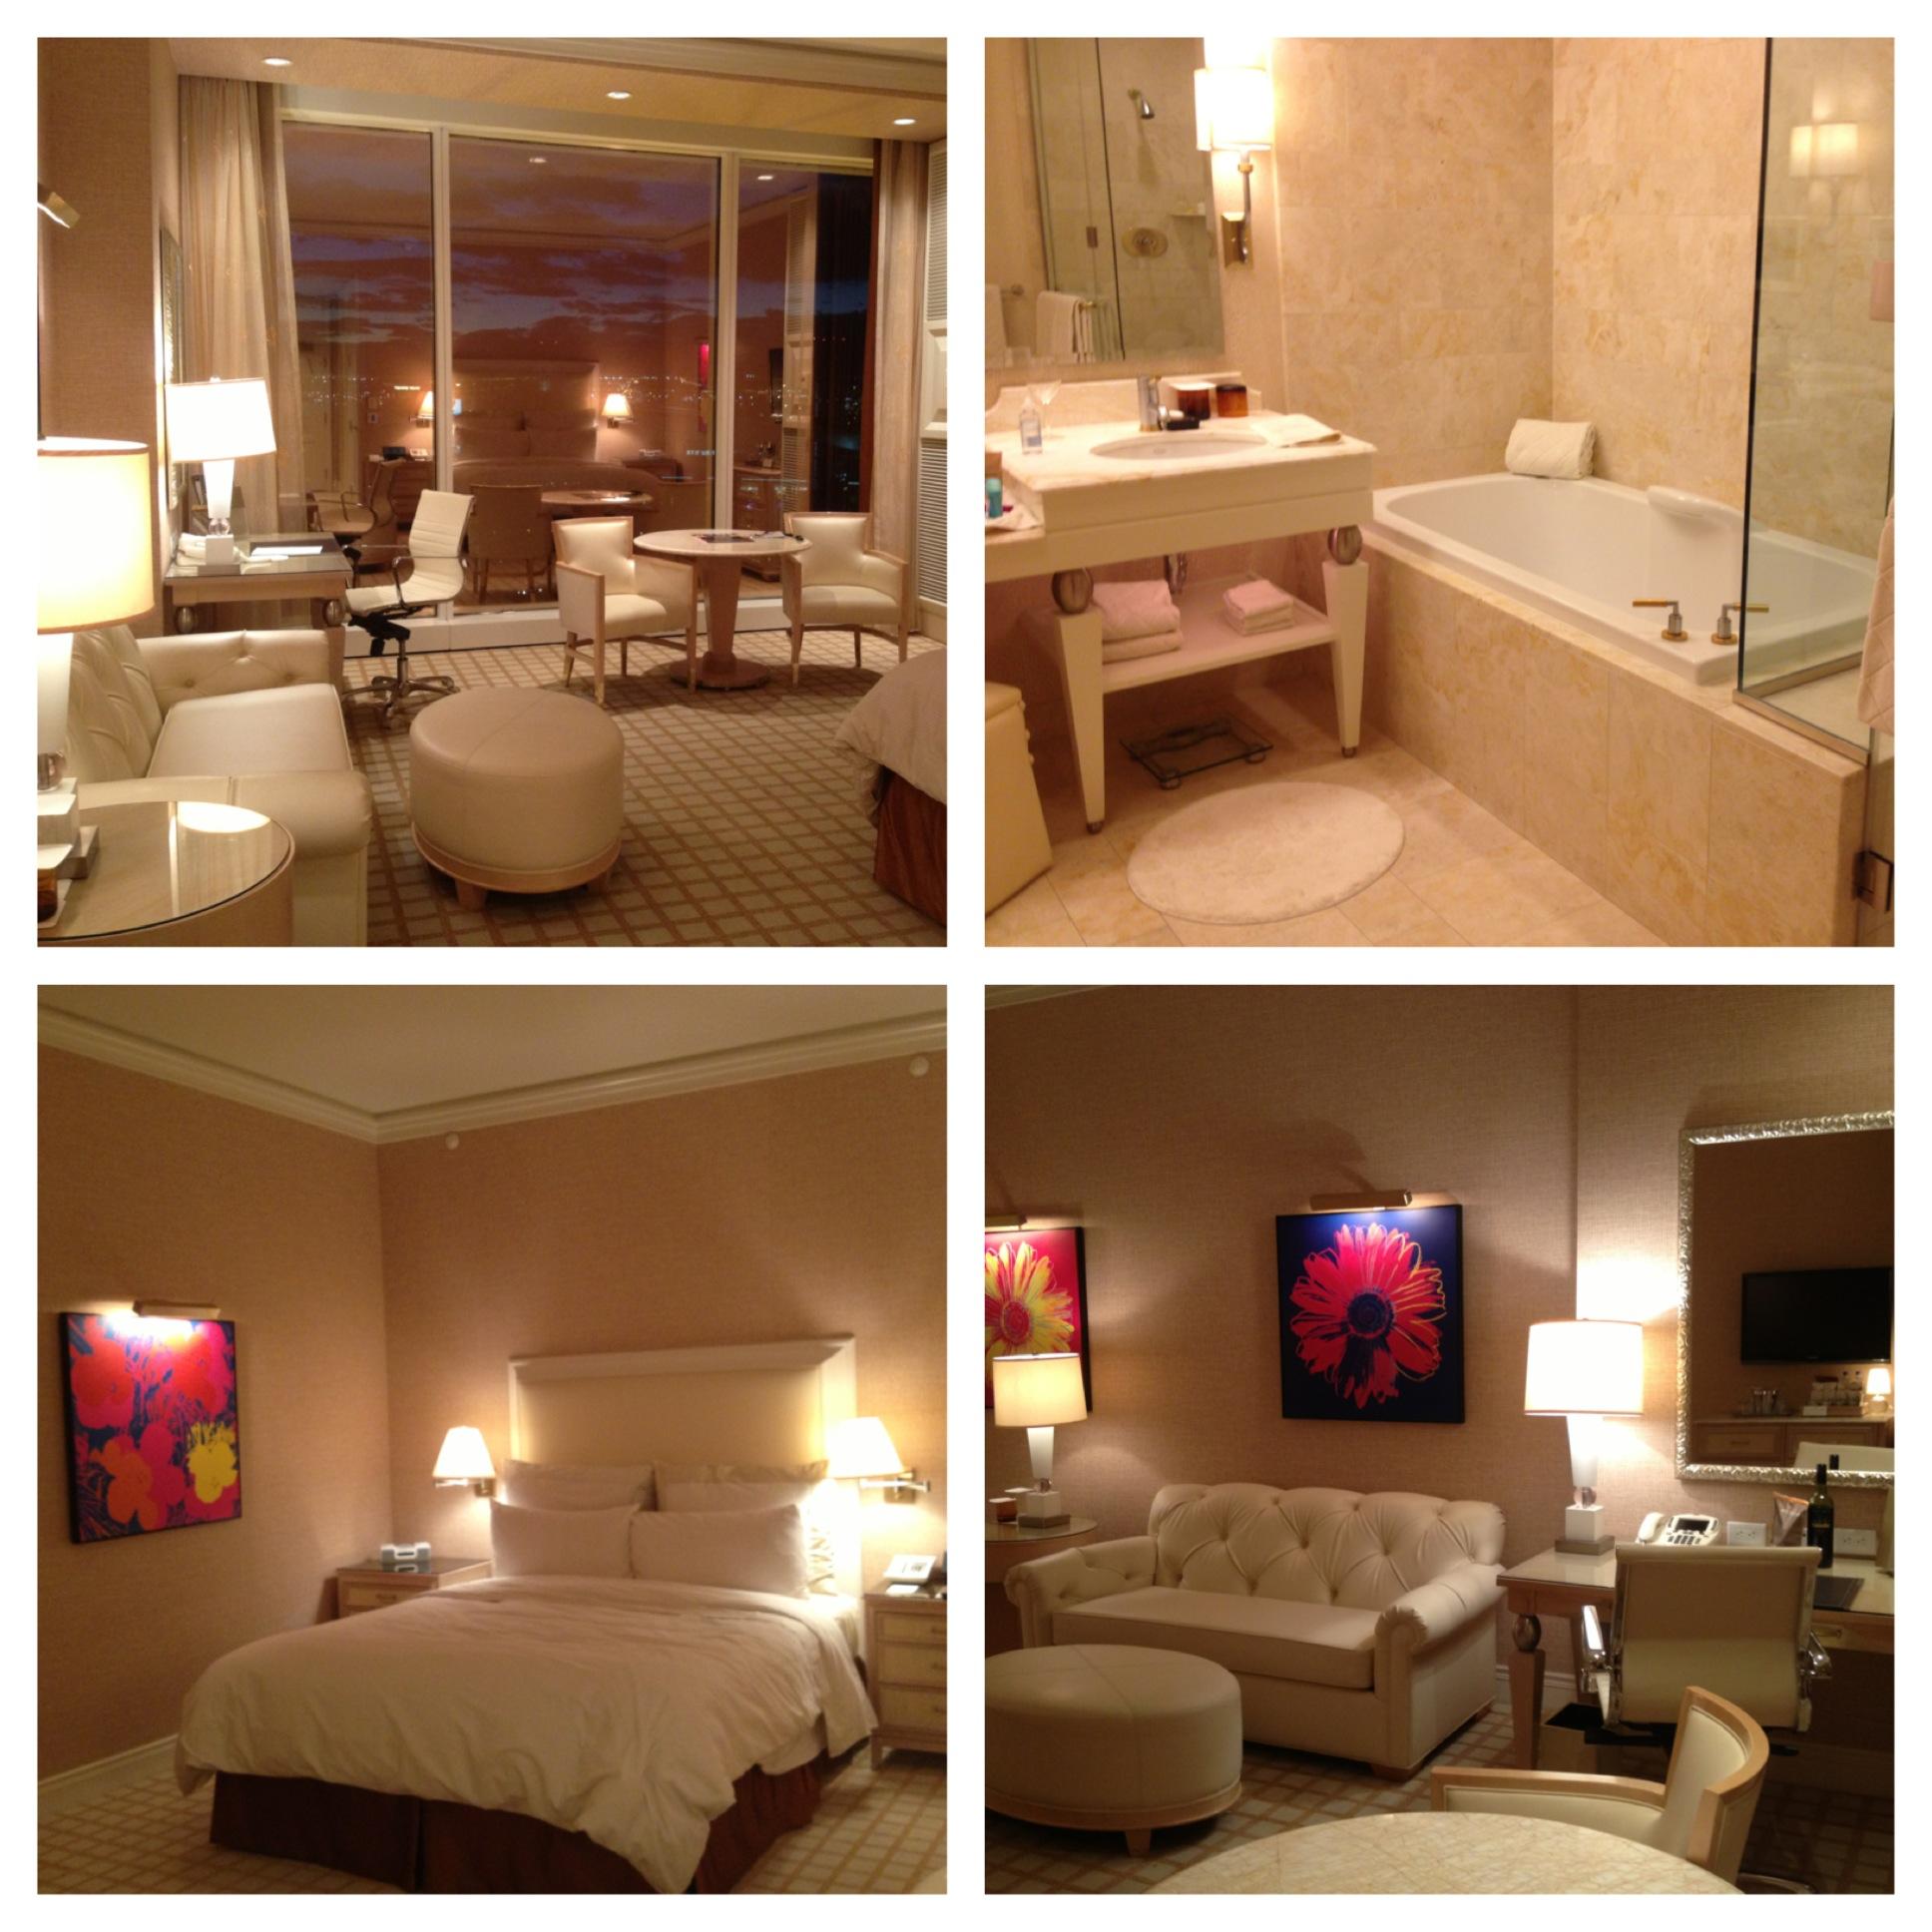 Las Vegas 3 Bedroom Suites Wynn Las Vegas 2 Bedroom Suites Wynn Salon Suite Wynn Theater